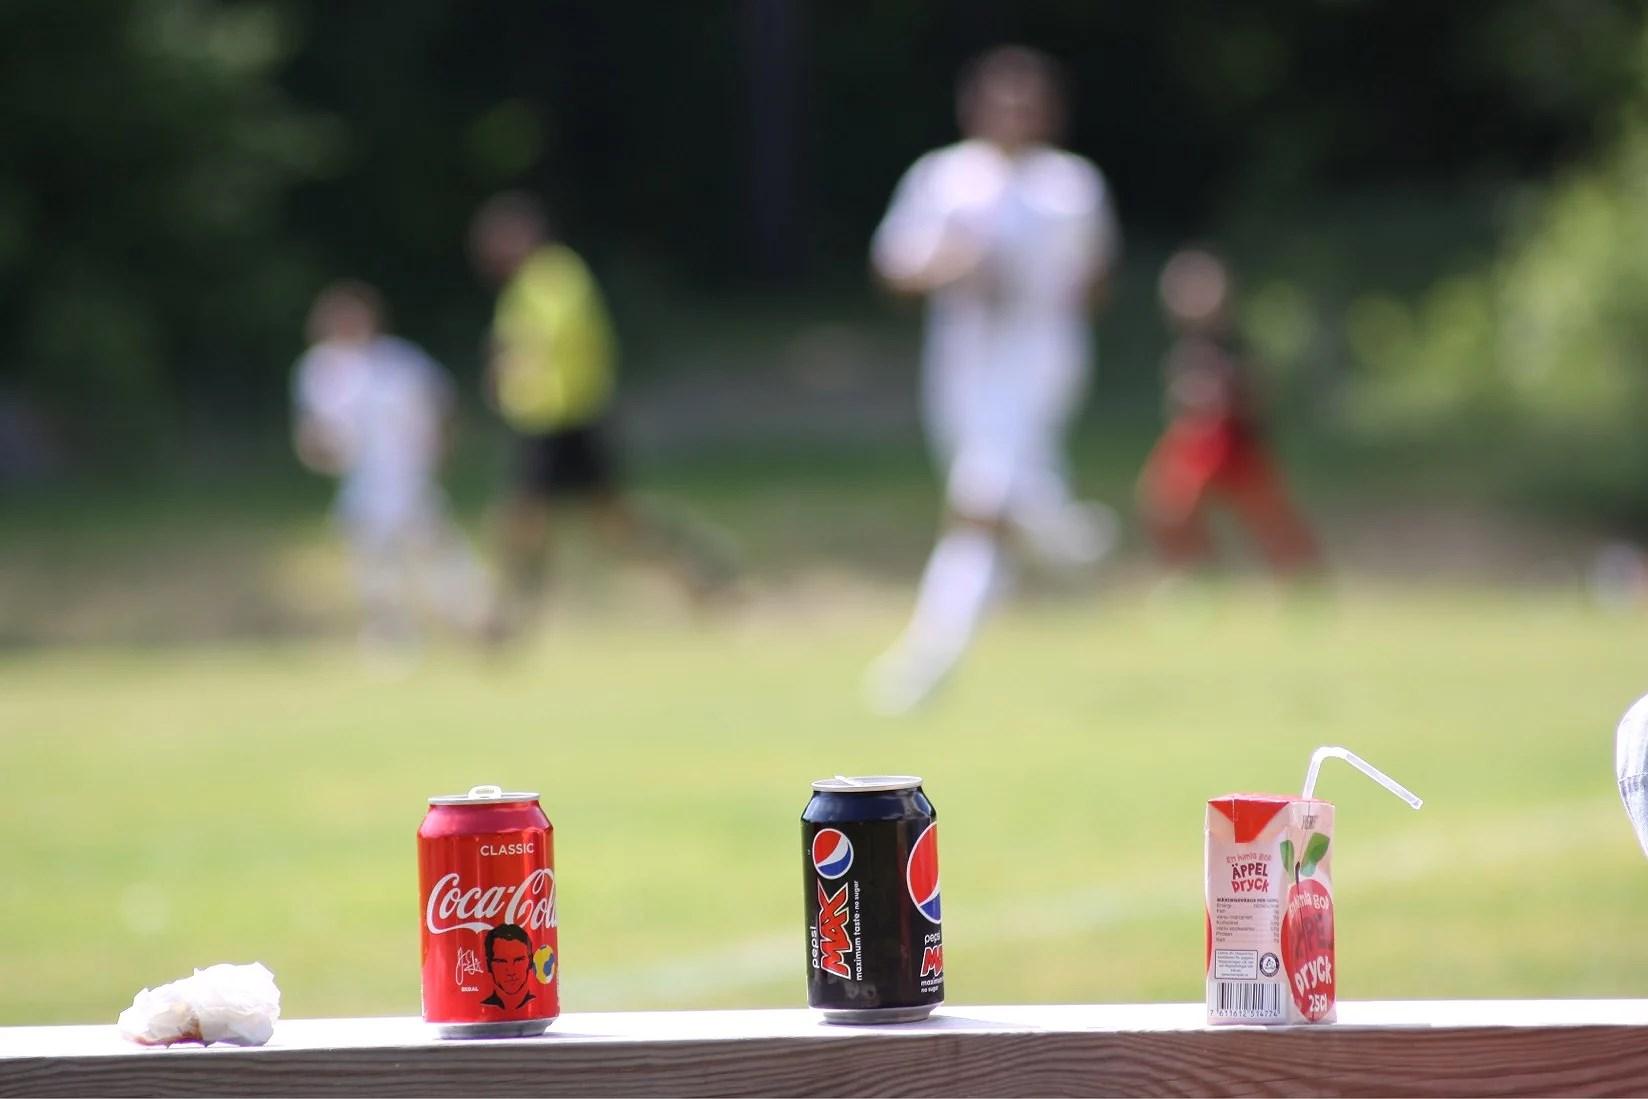 Kurtis och fotbollsmatch